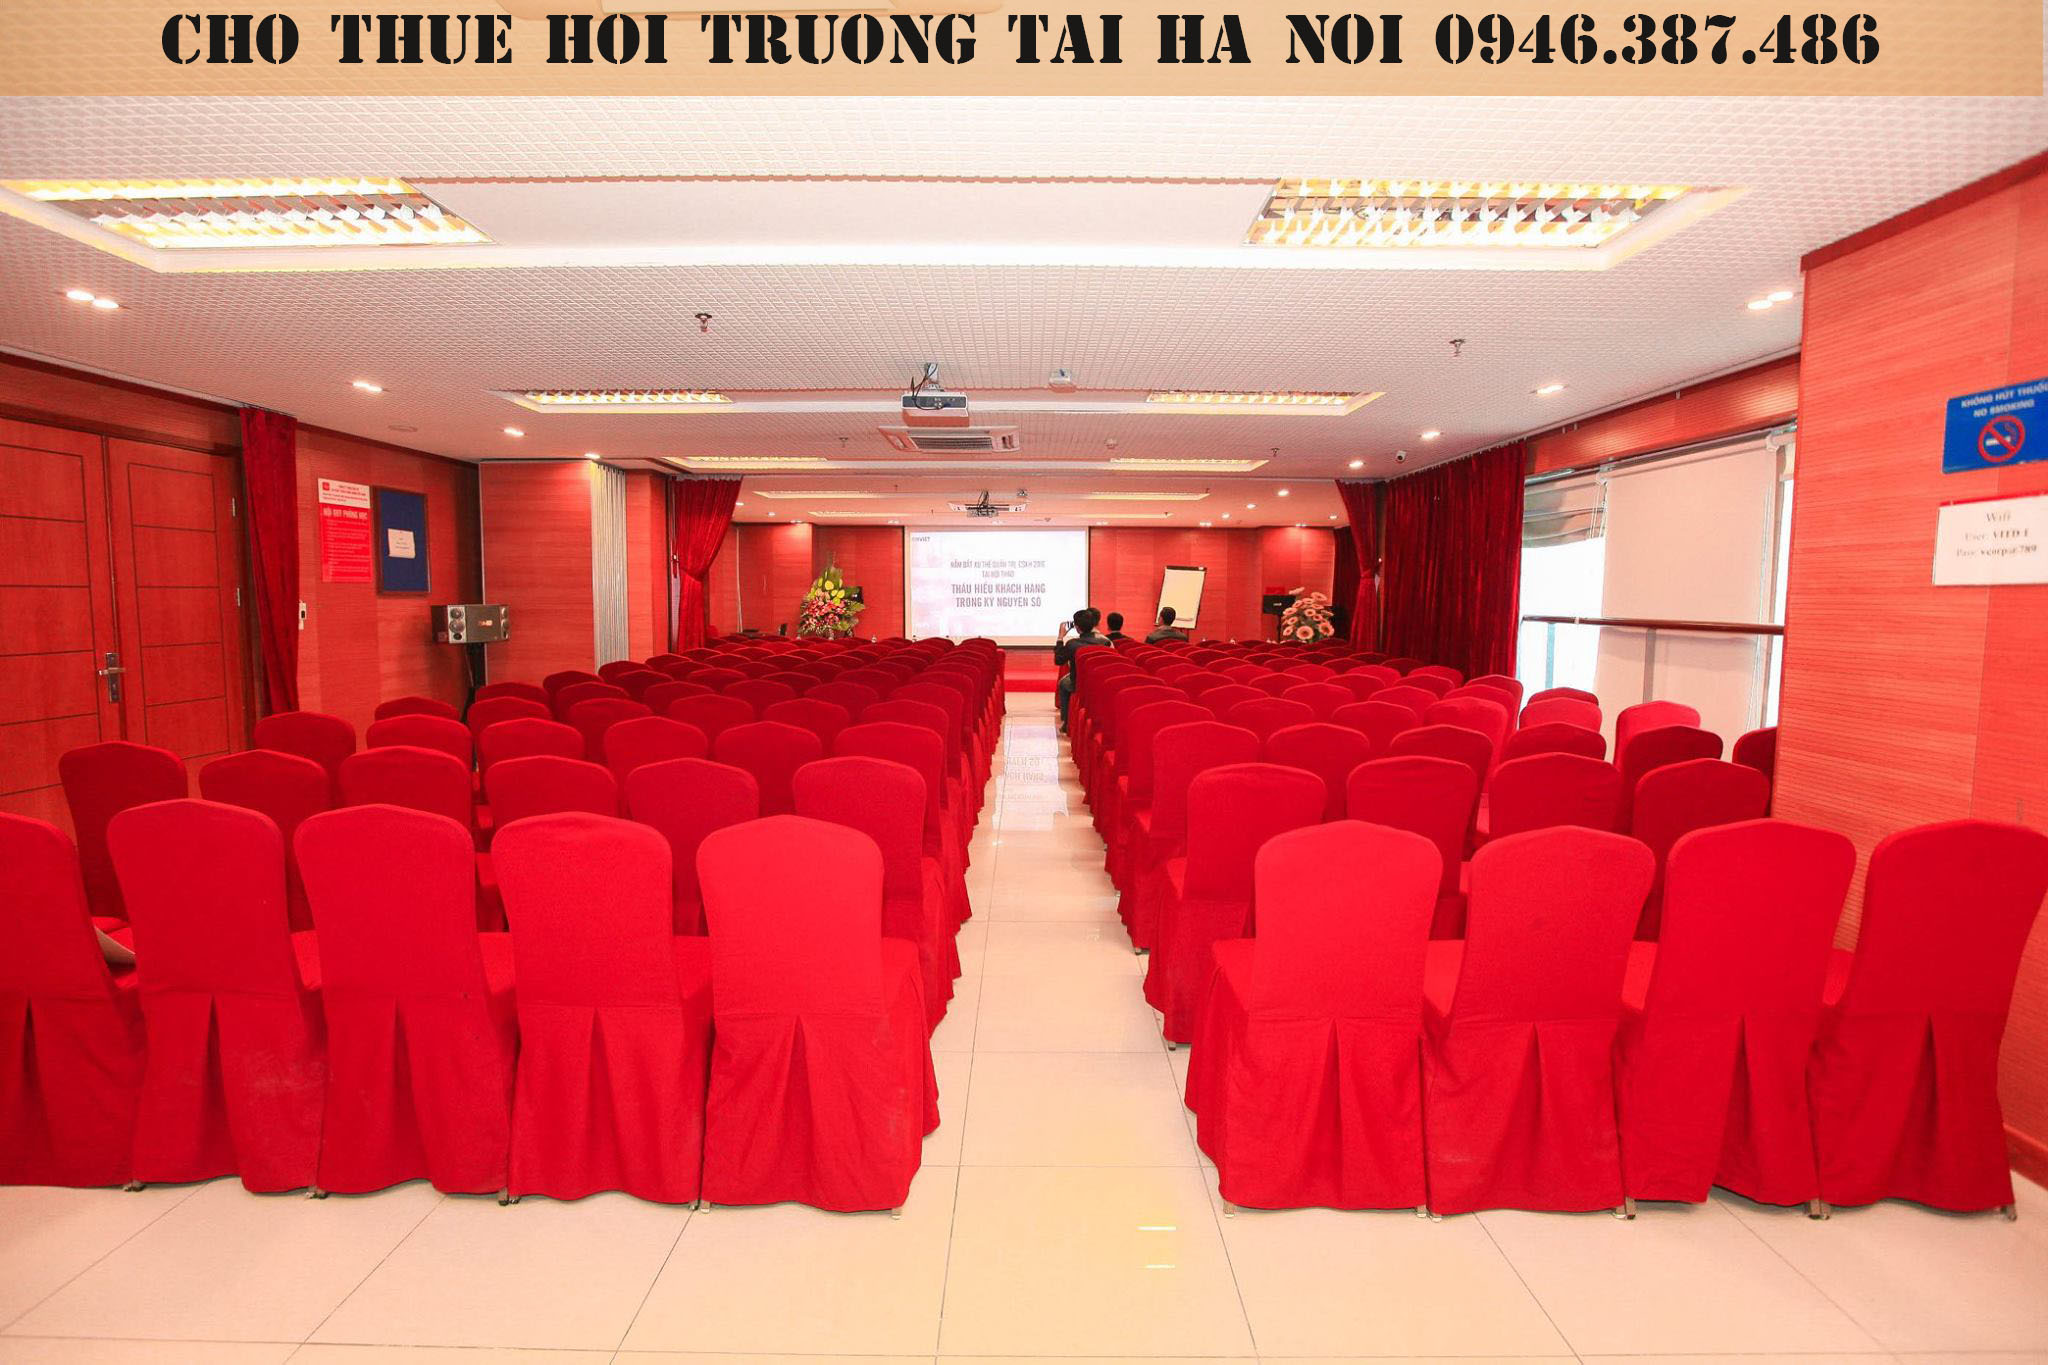 cho-thue-hoi-truong-tai-ha-noi-1